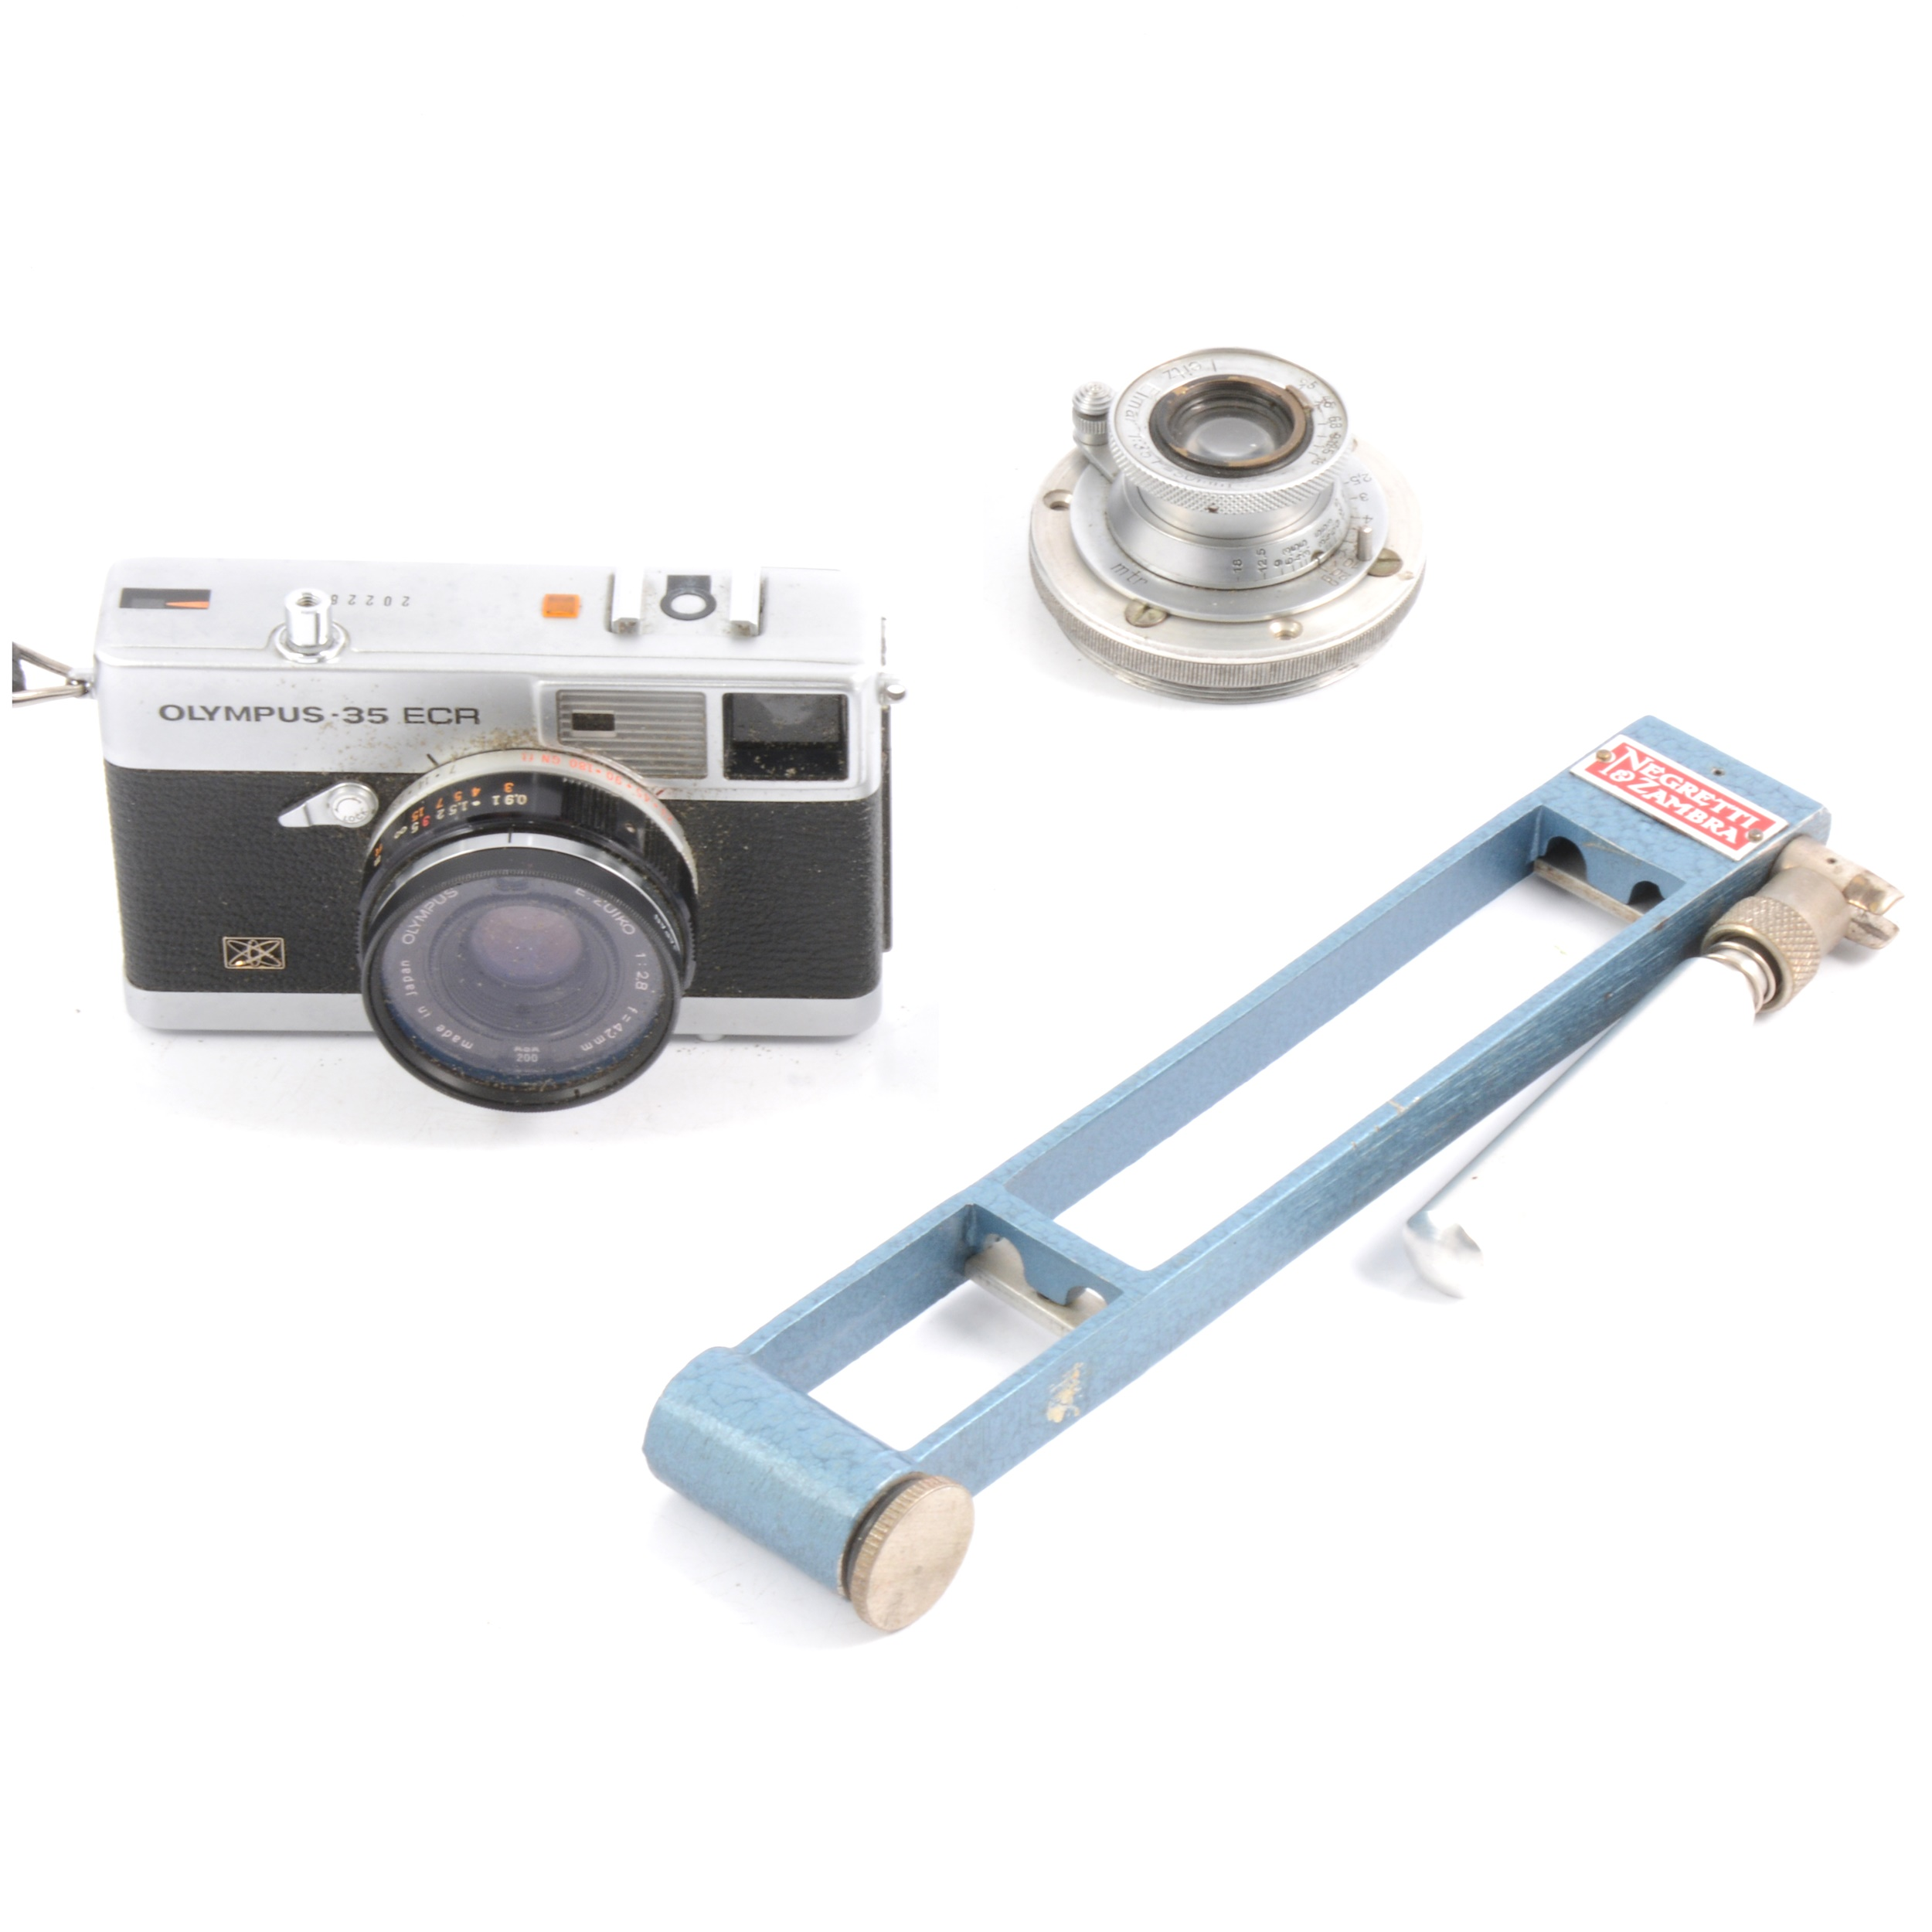 Olympus camera, Leitz Elmar lens, and a hygrometer.